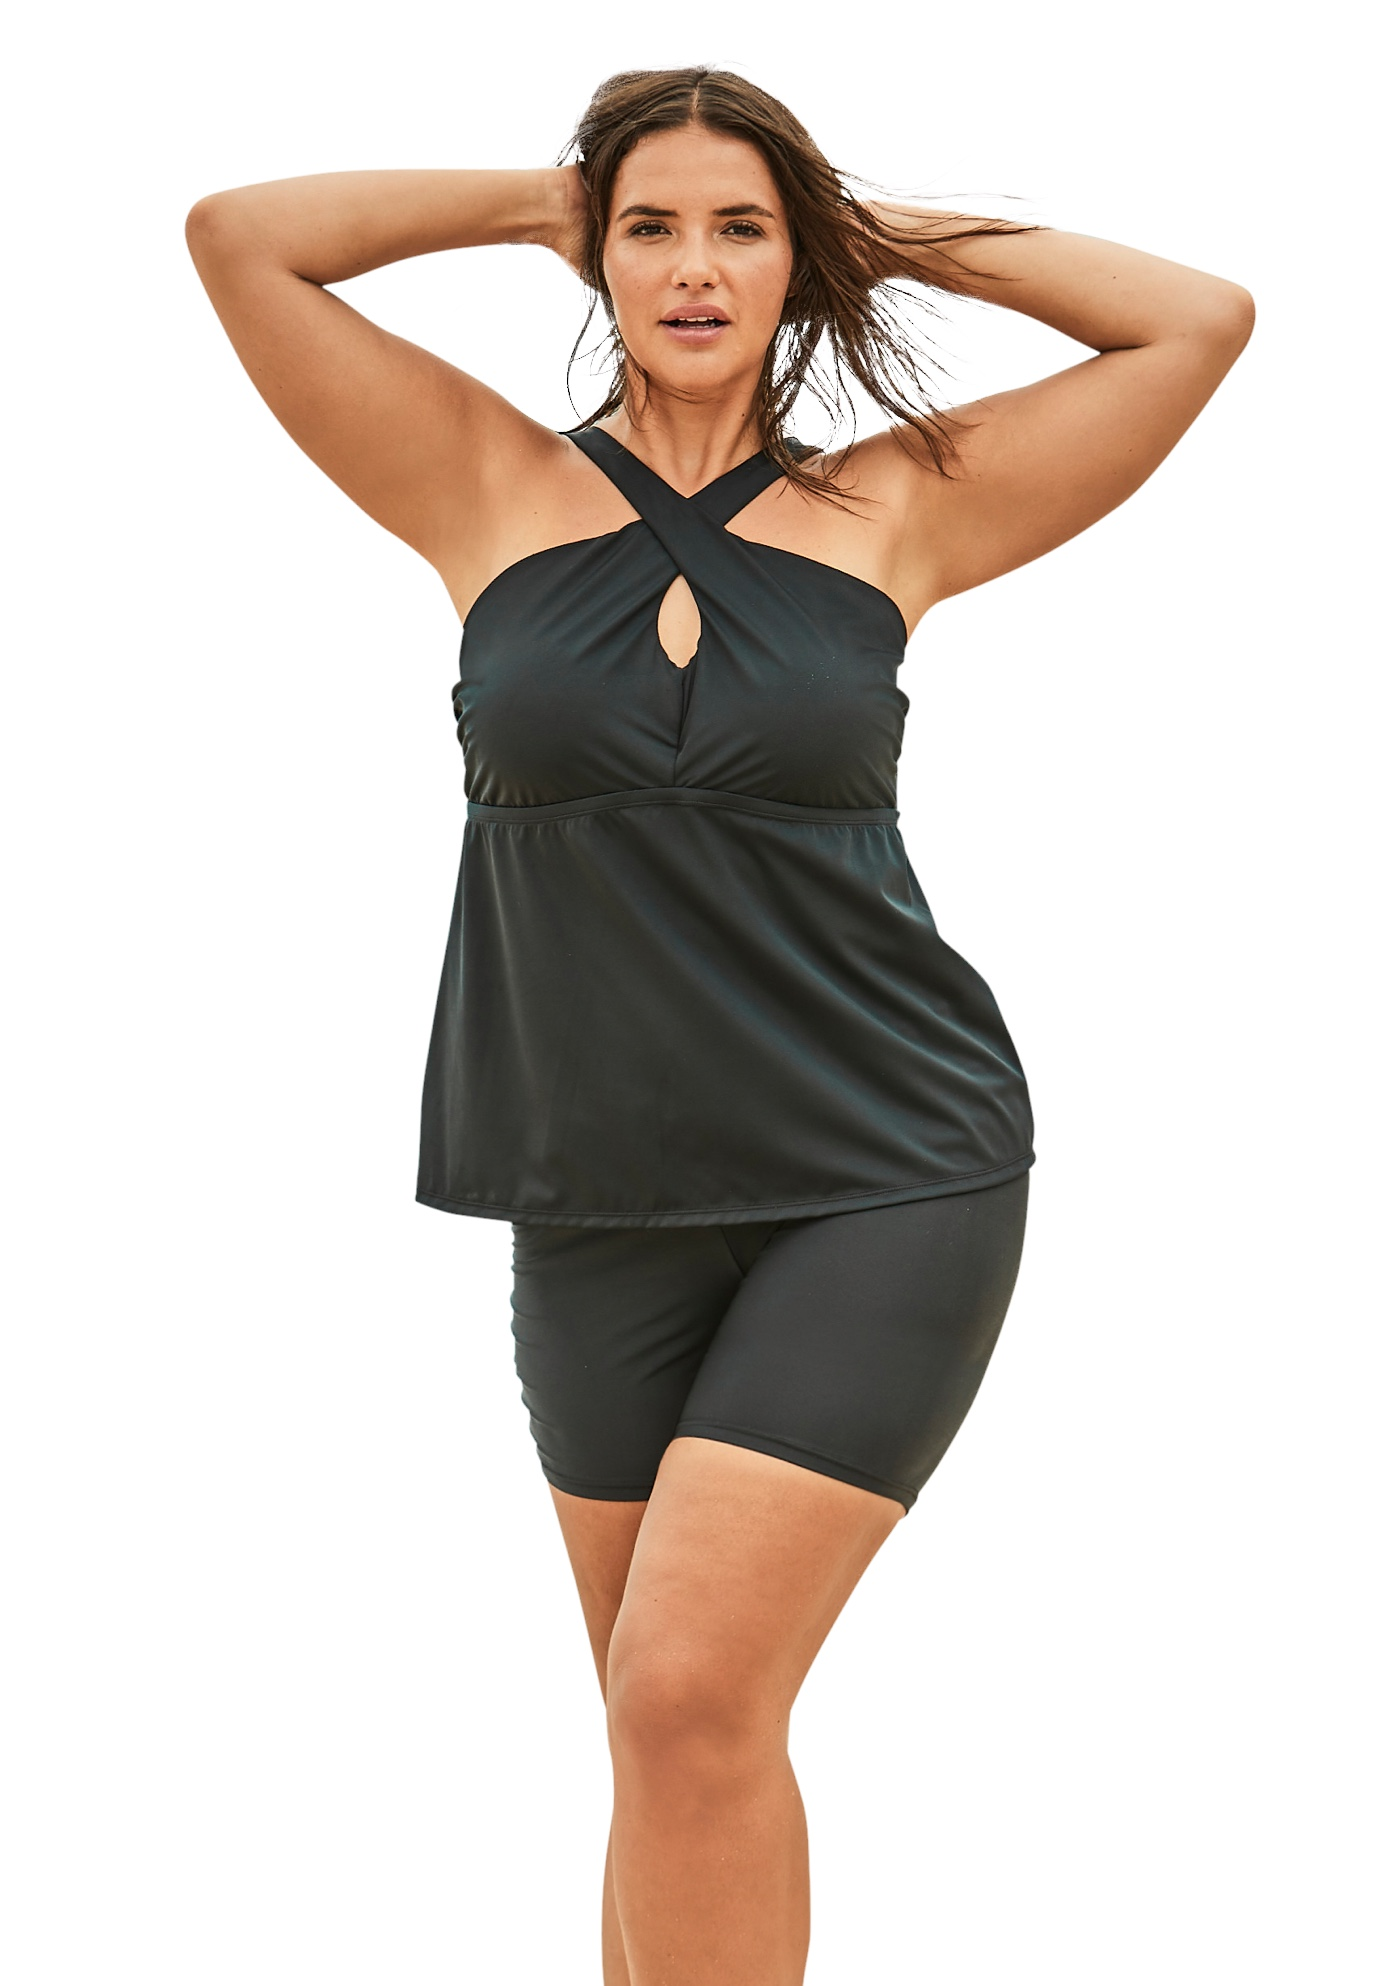 Plus Size Women's Crossover Tankini Top by Swim 365 in Black